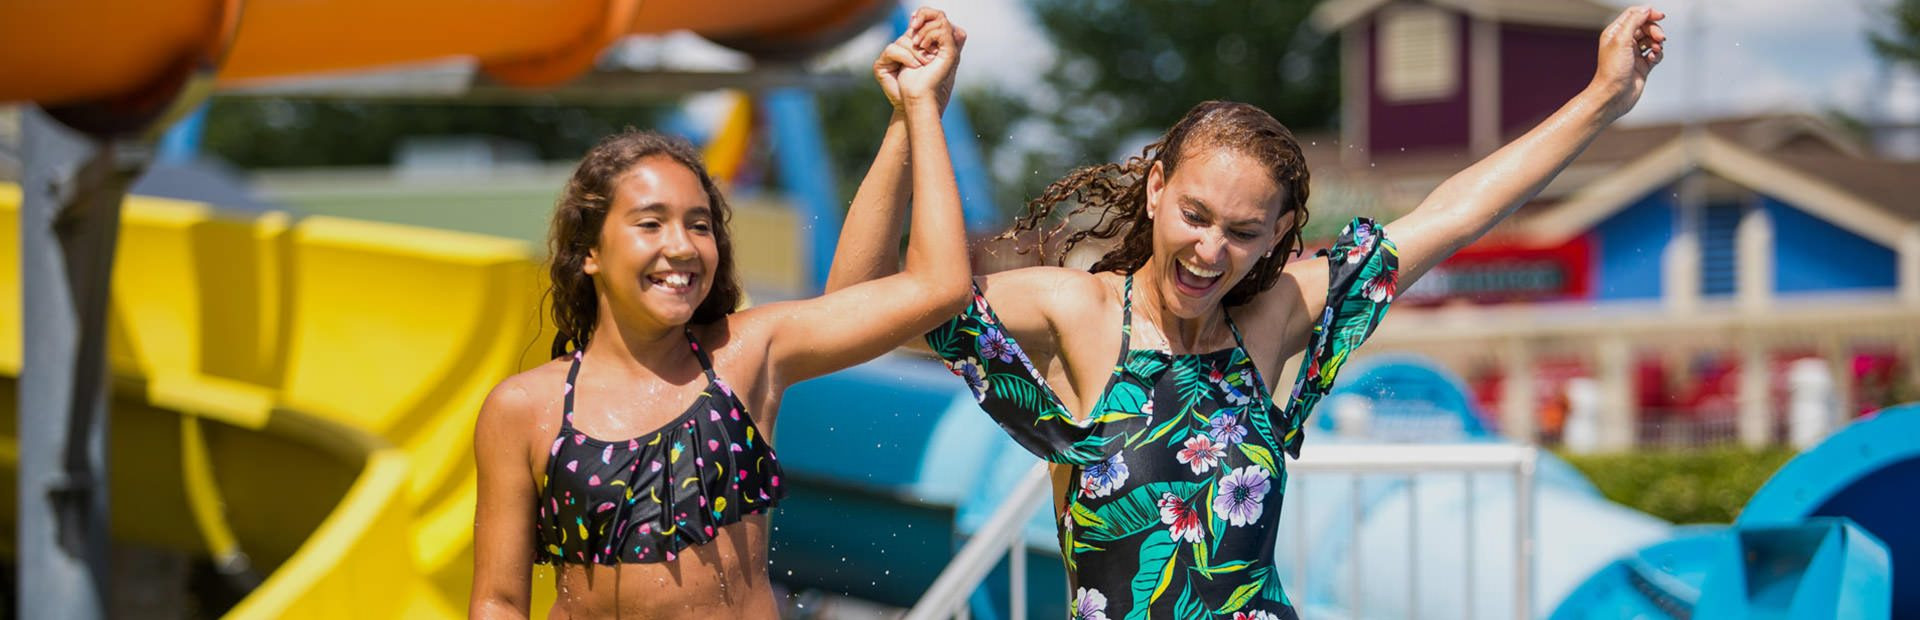 Girls in water park